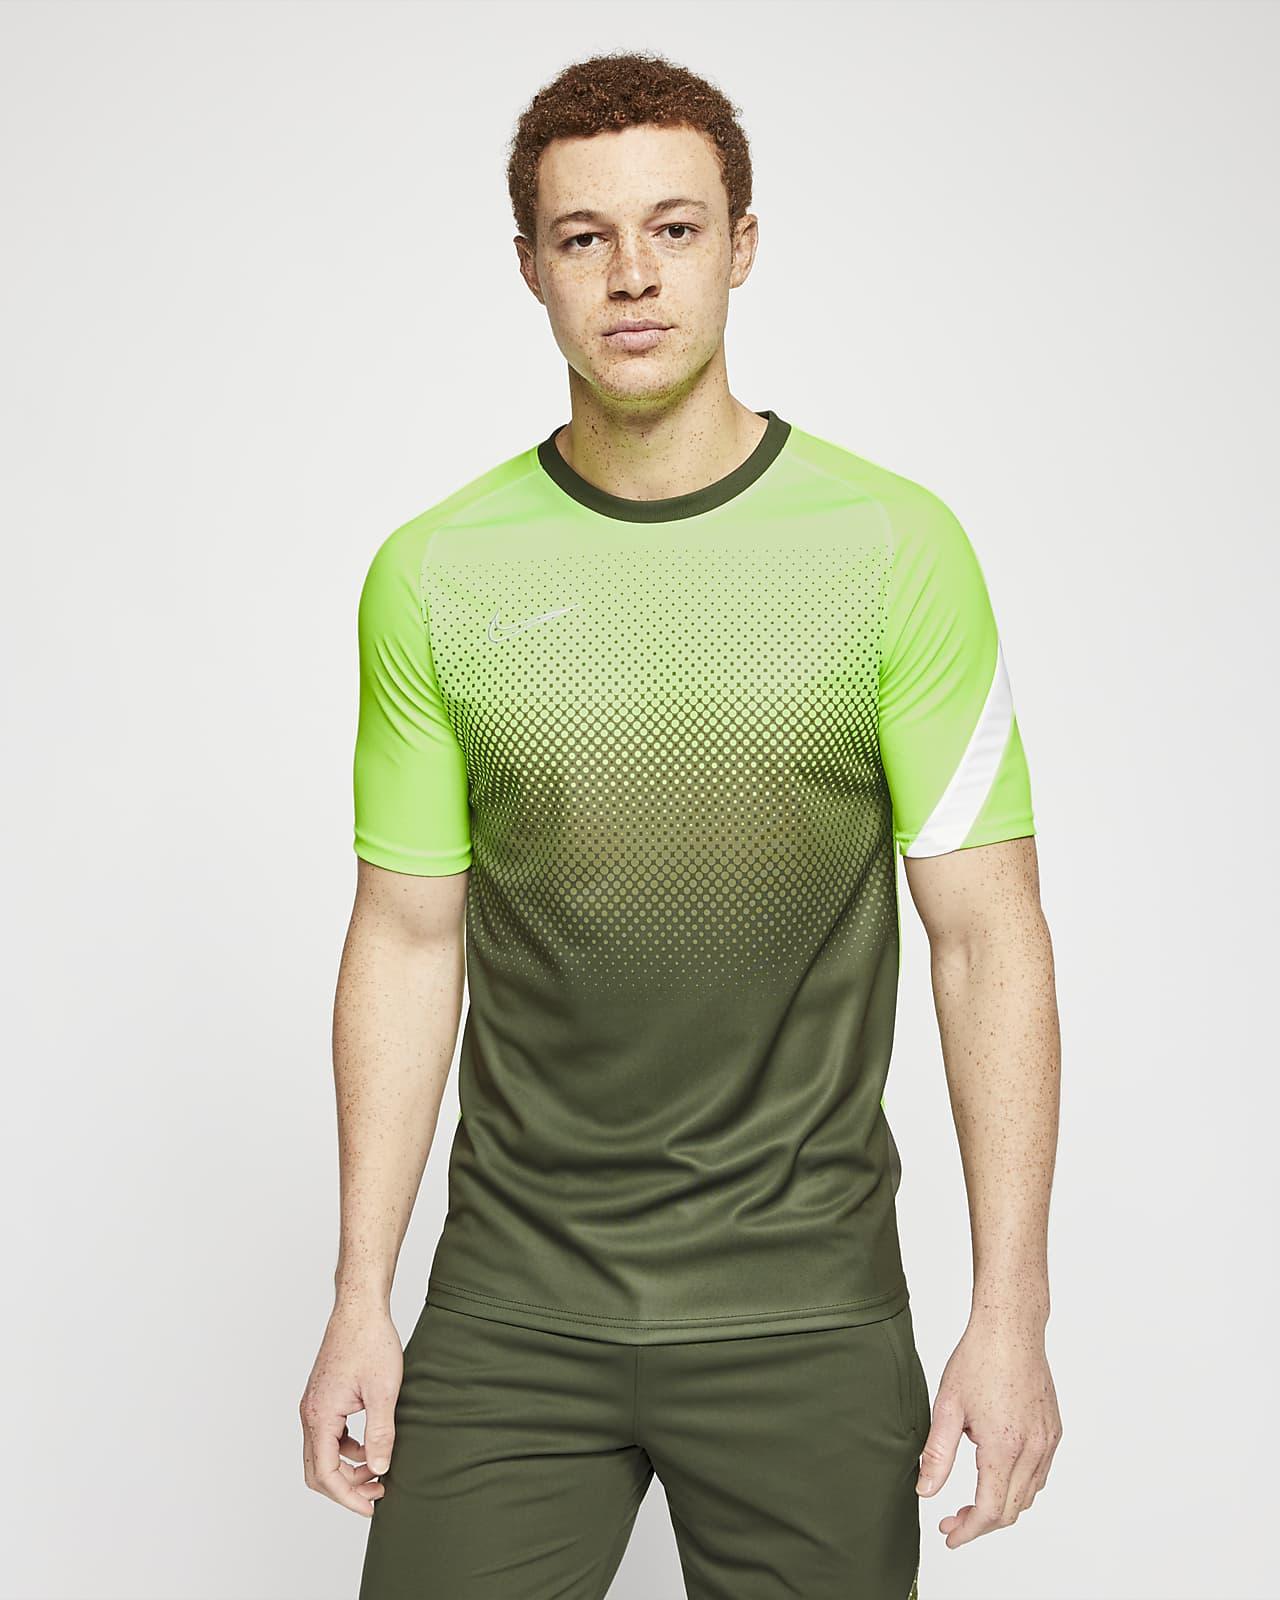 Camiseta de fútbol estampada de manga corta para hombre Nike Dri-FIT Academy